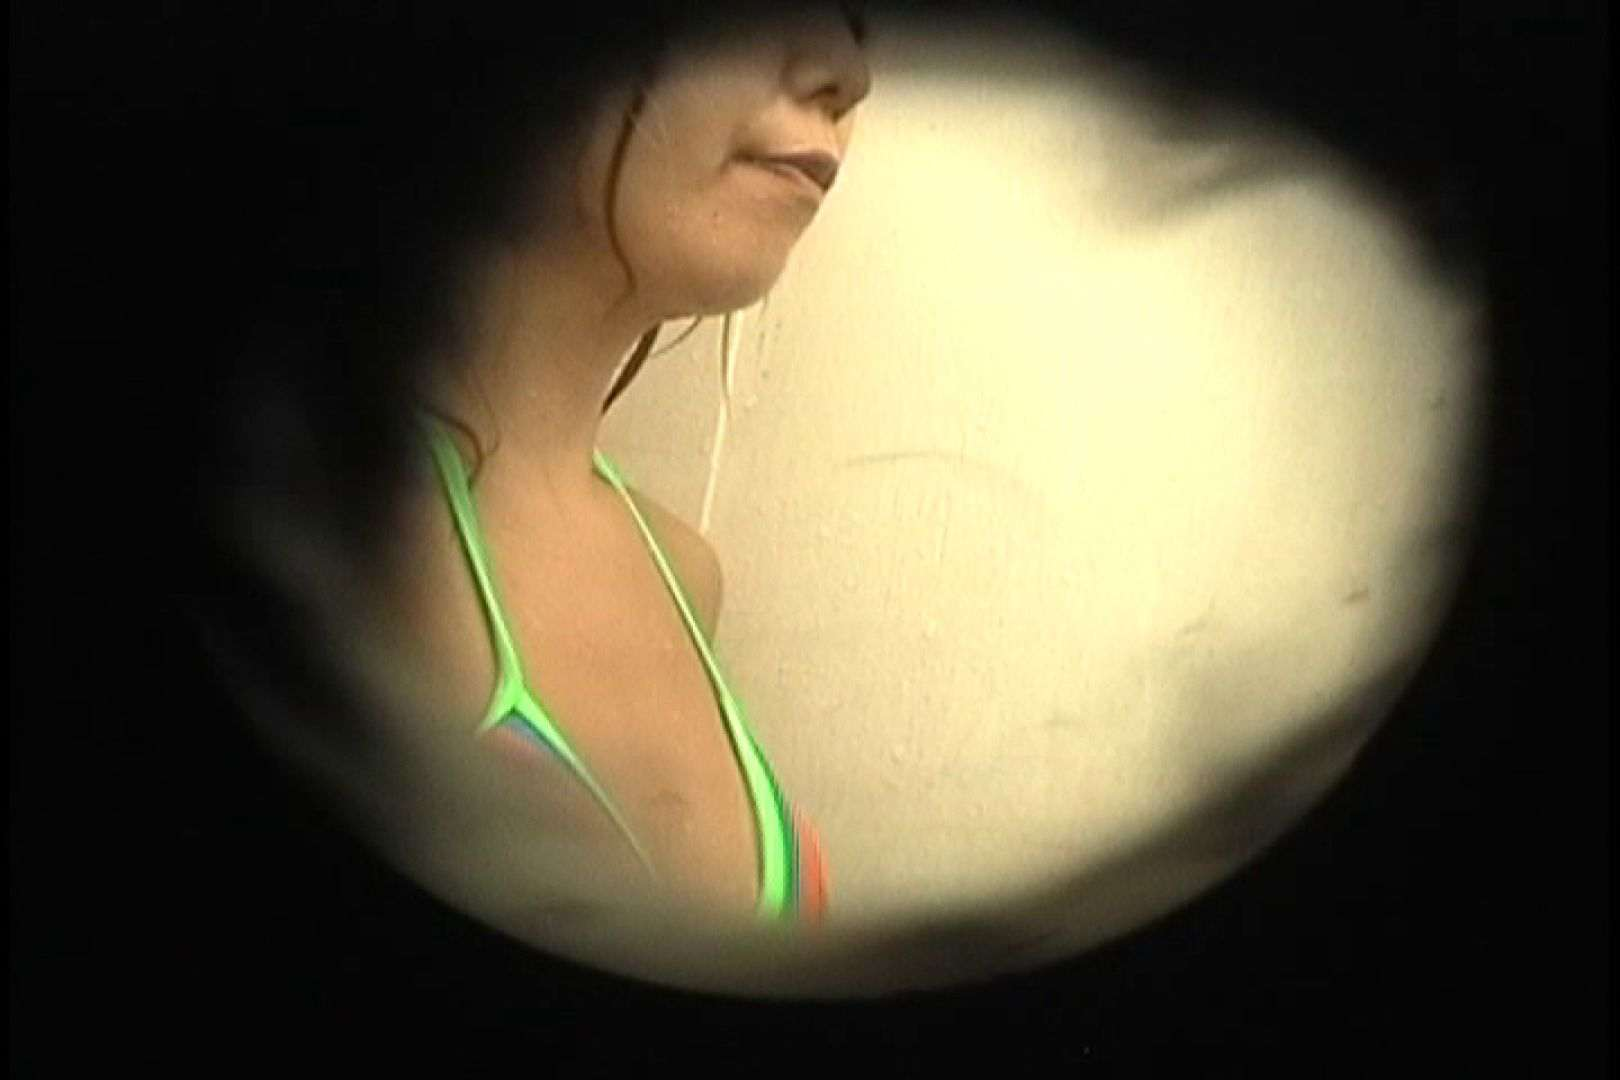 No.26 腰にタトゥー、バックスジマン発見! シャワー室   シャワー  113画像 51